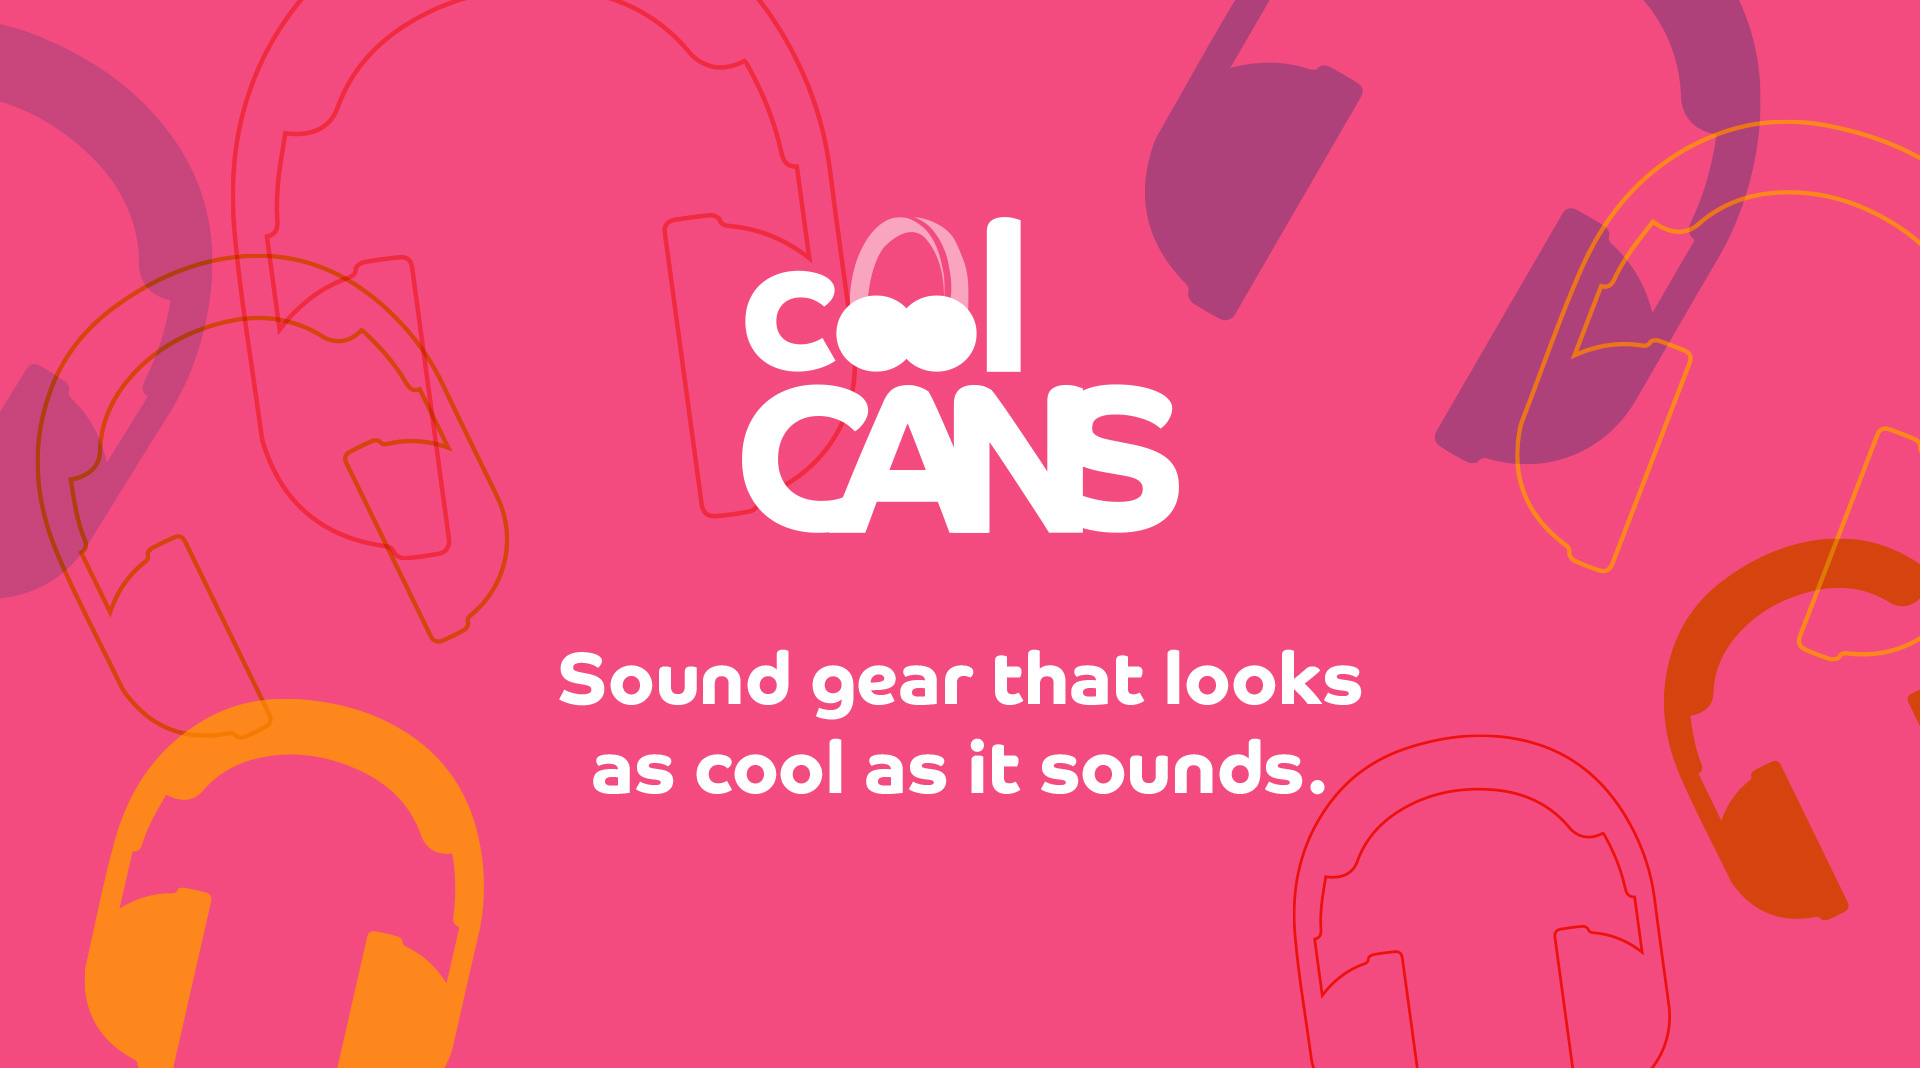 CoolCans Branding elements